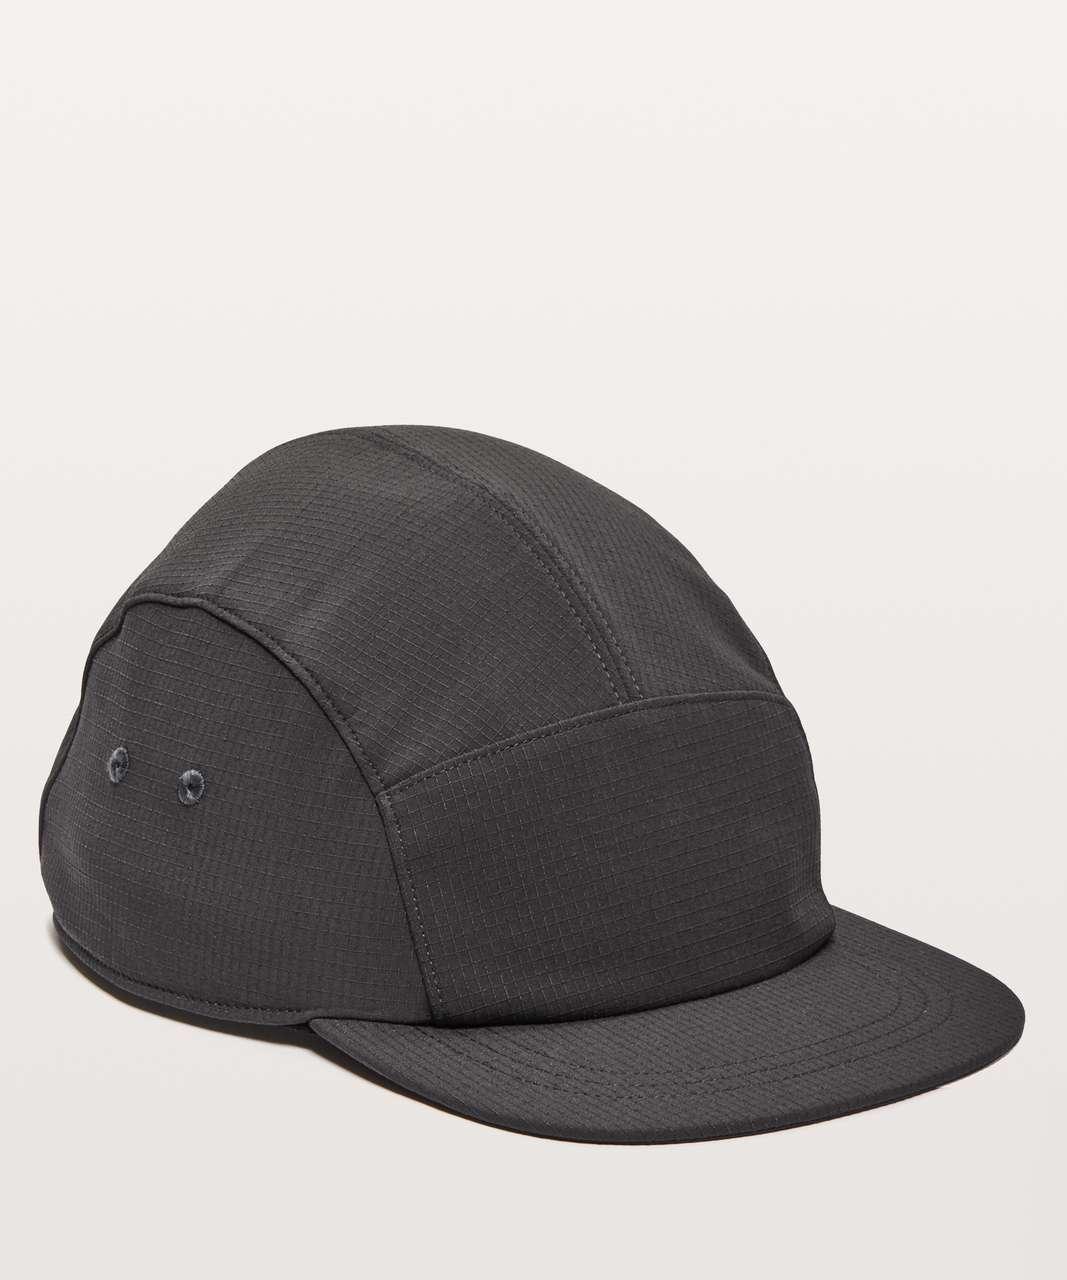 Lululemon Five Times Hat - Blue Tied